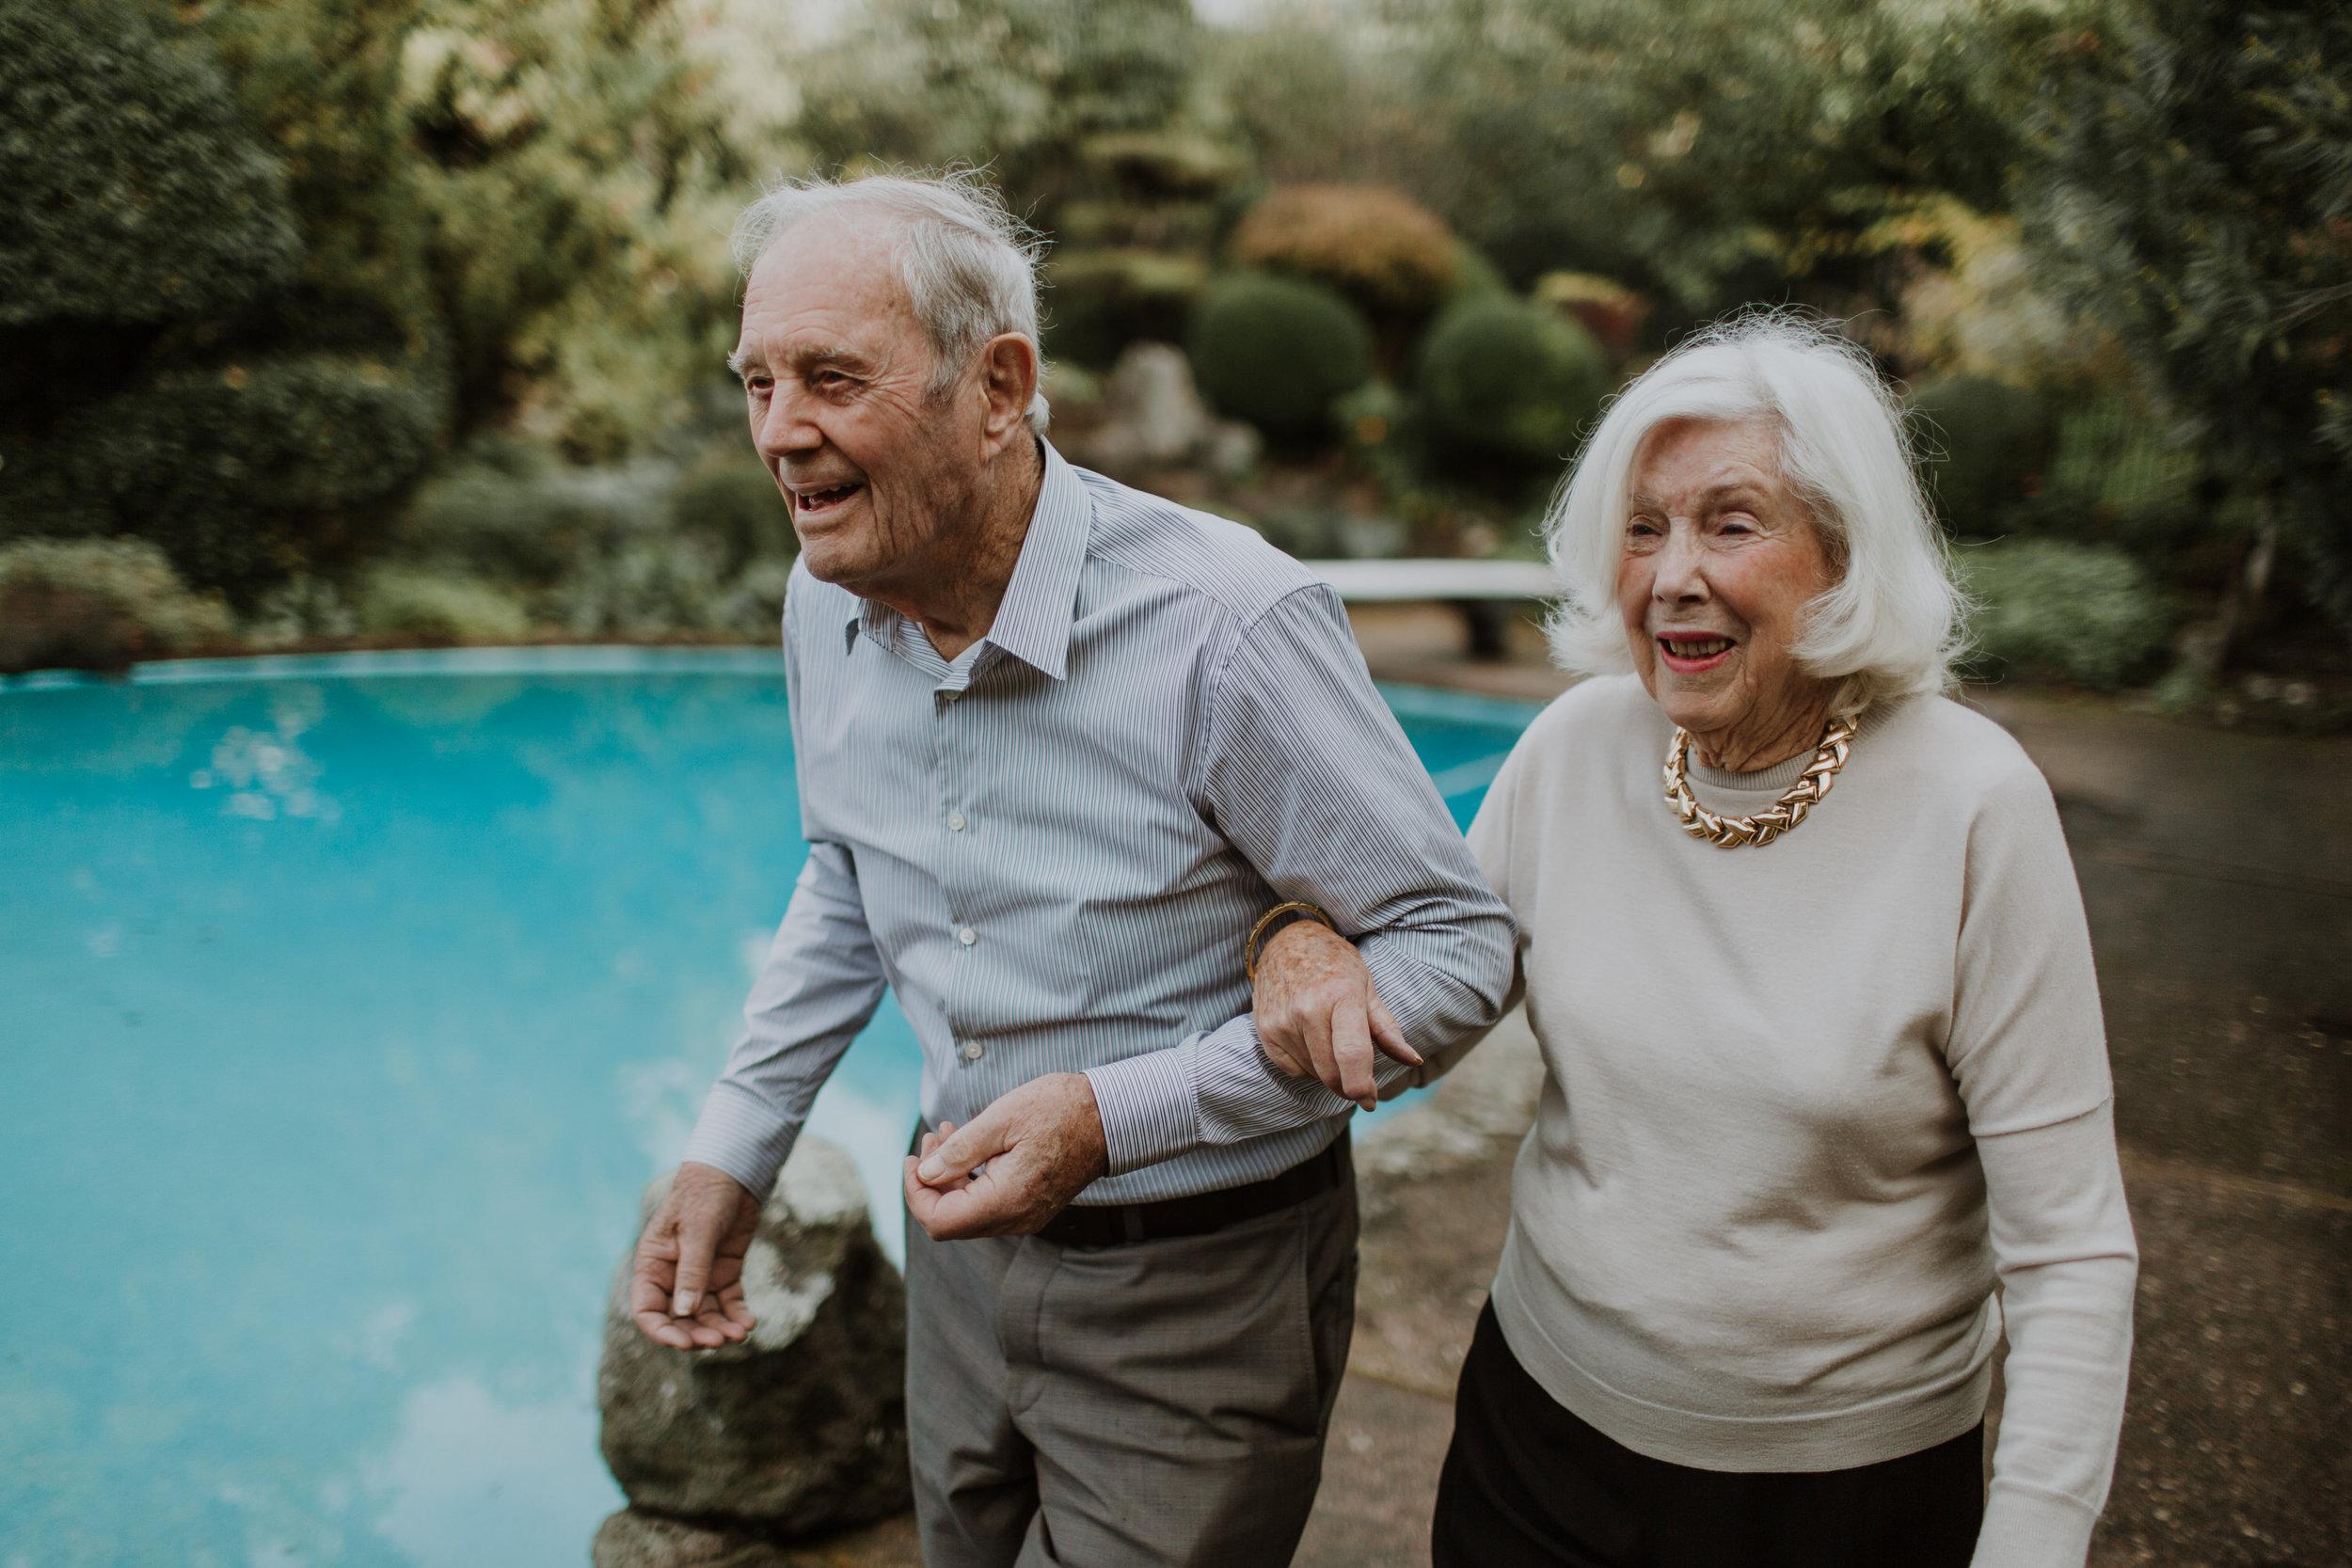 Gretchen Gause, Bay Area Photographer #familyphotos #grandparents #couplesshoot  #bayarea #california #grandparents #lastinglove #marriagegoals #lifegoals